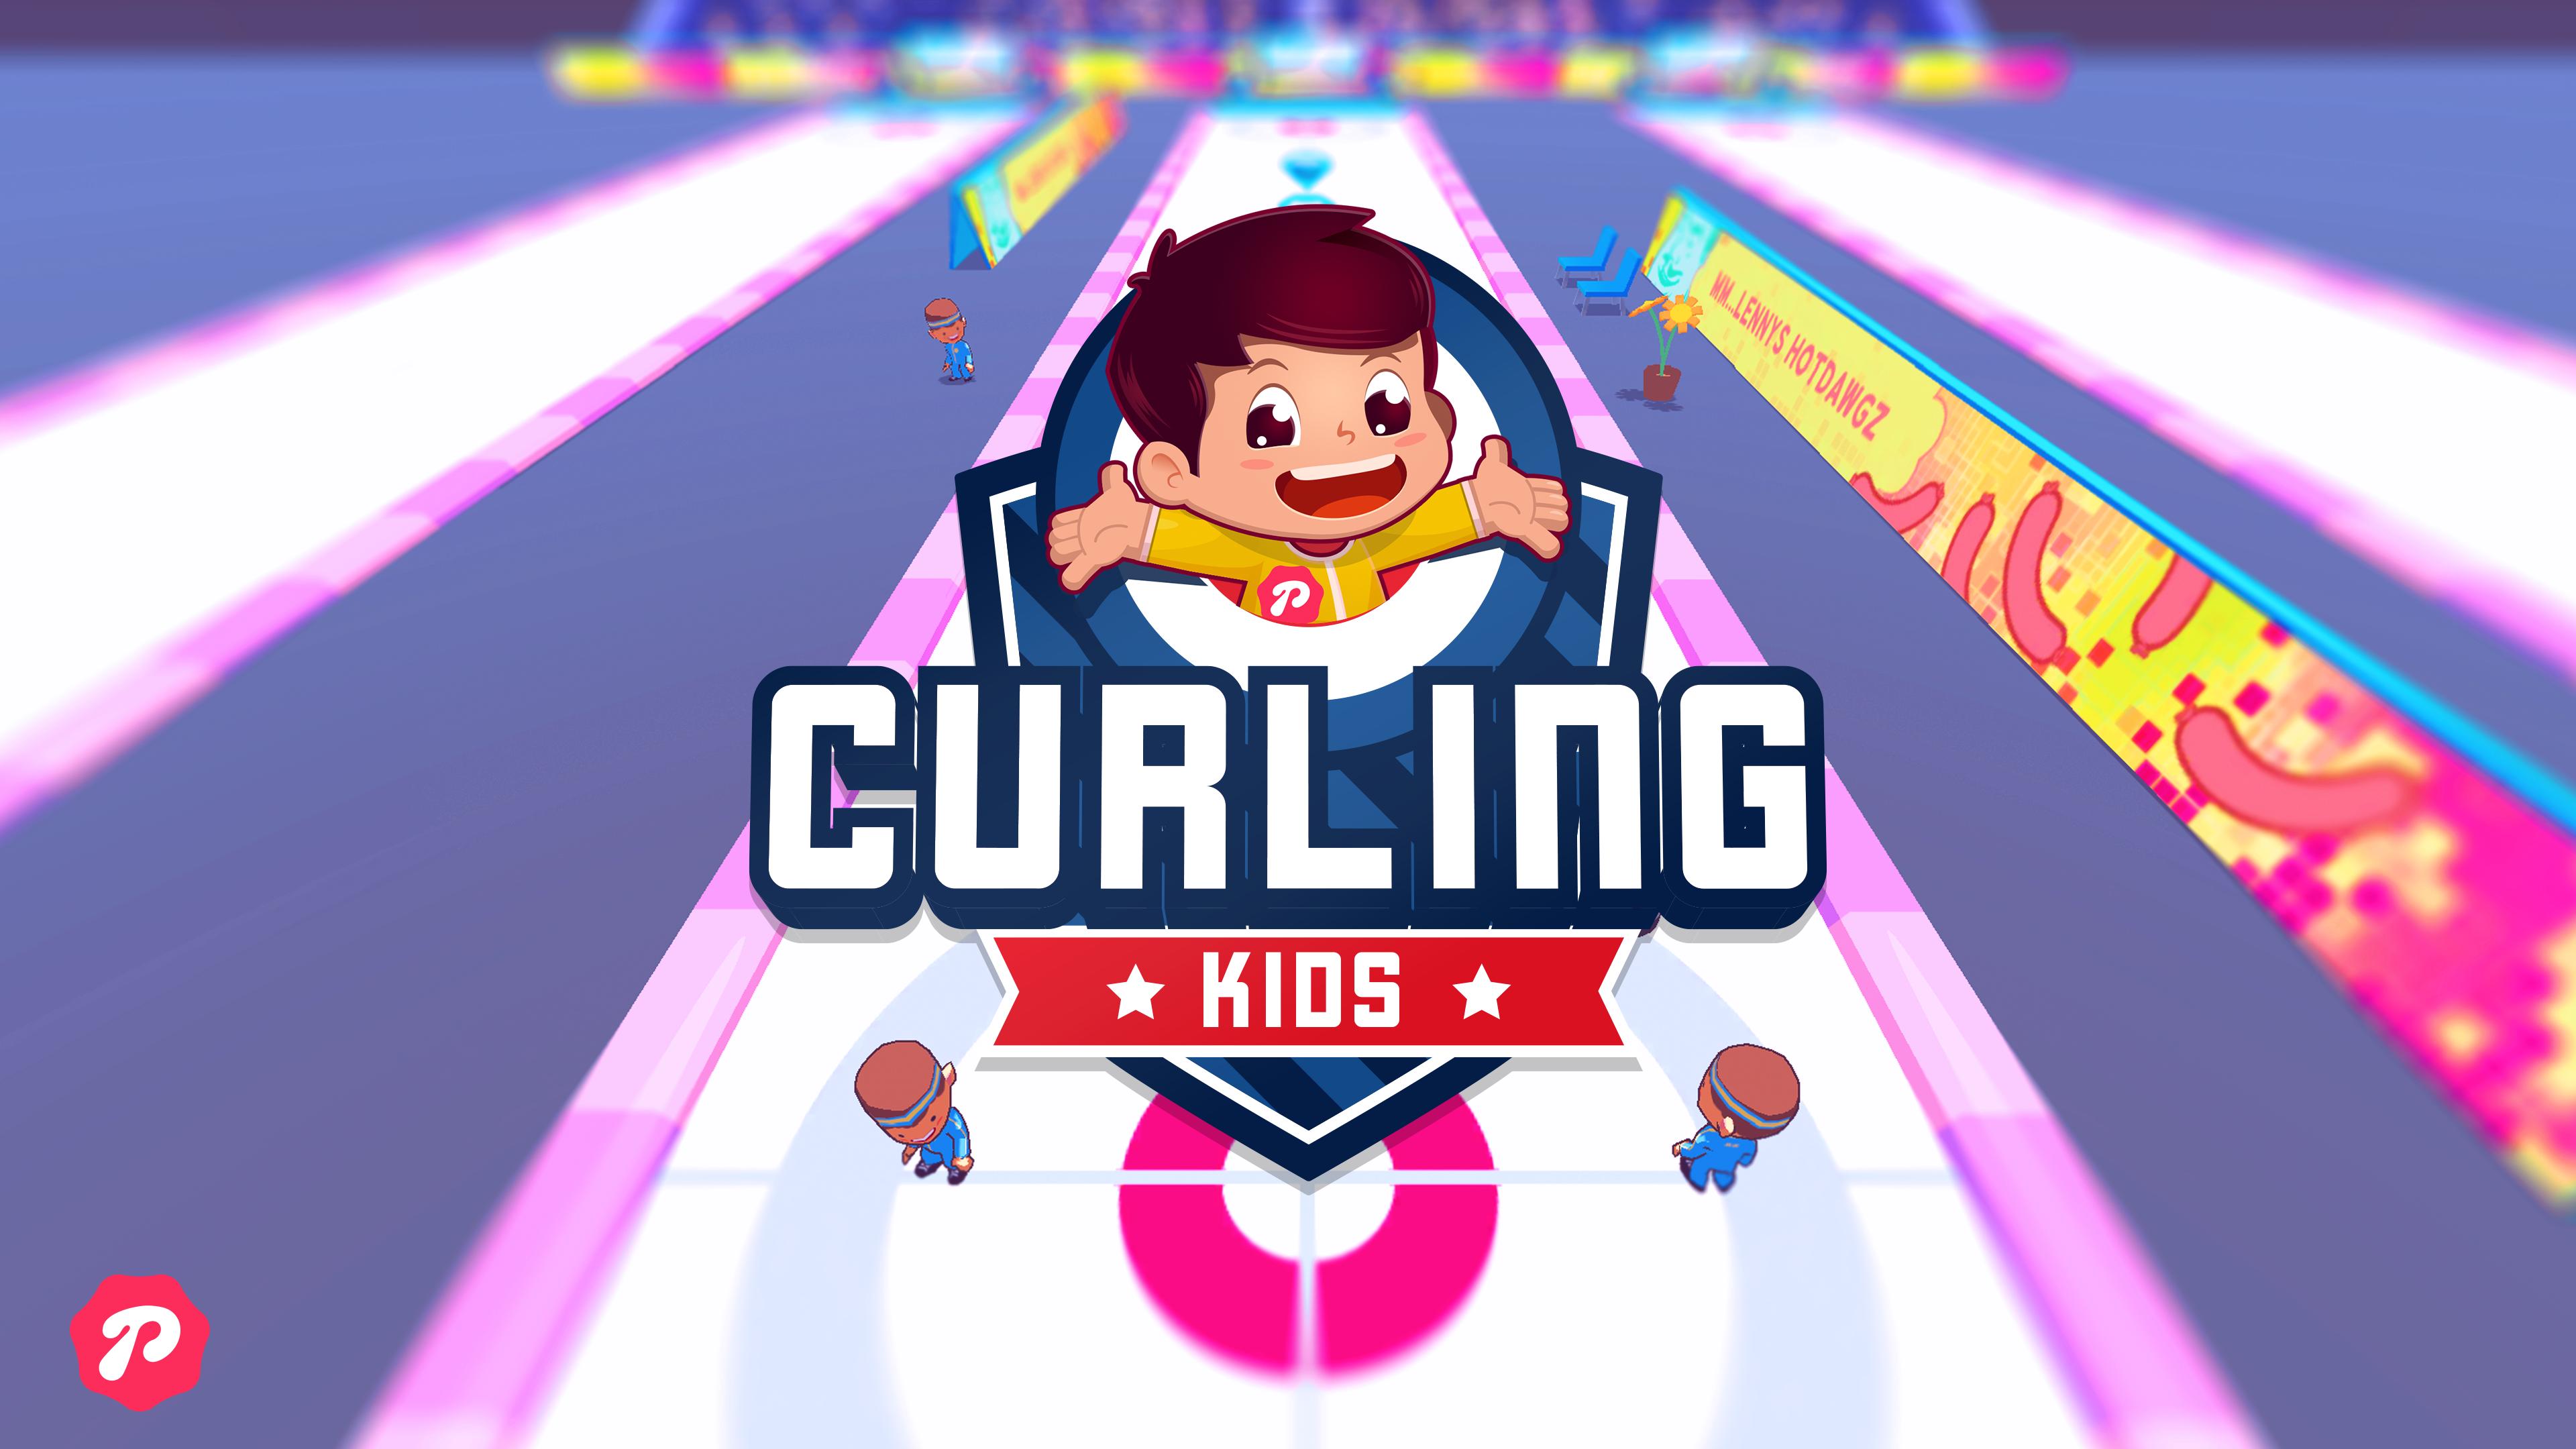 Curling Buddies